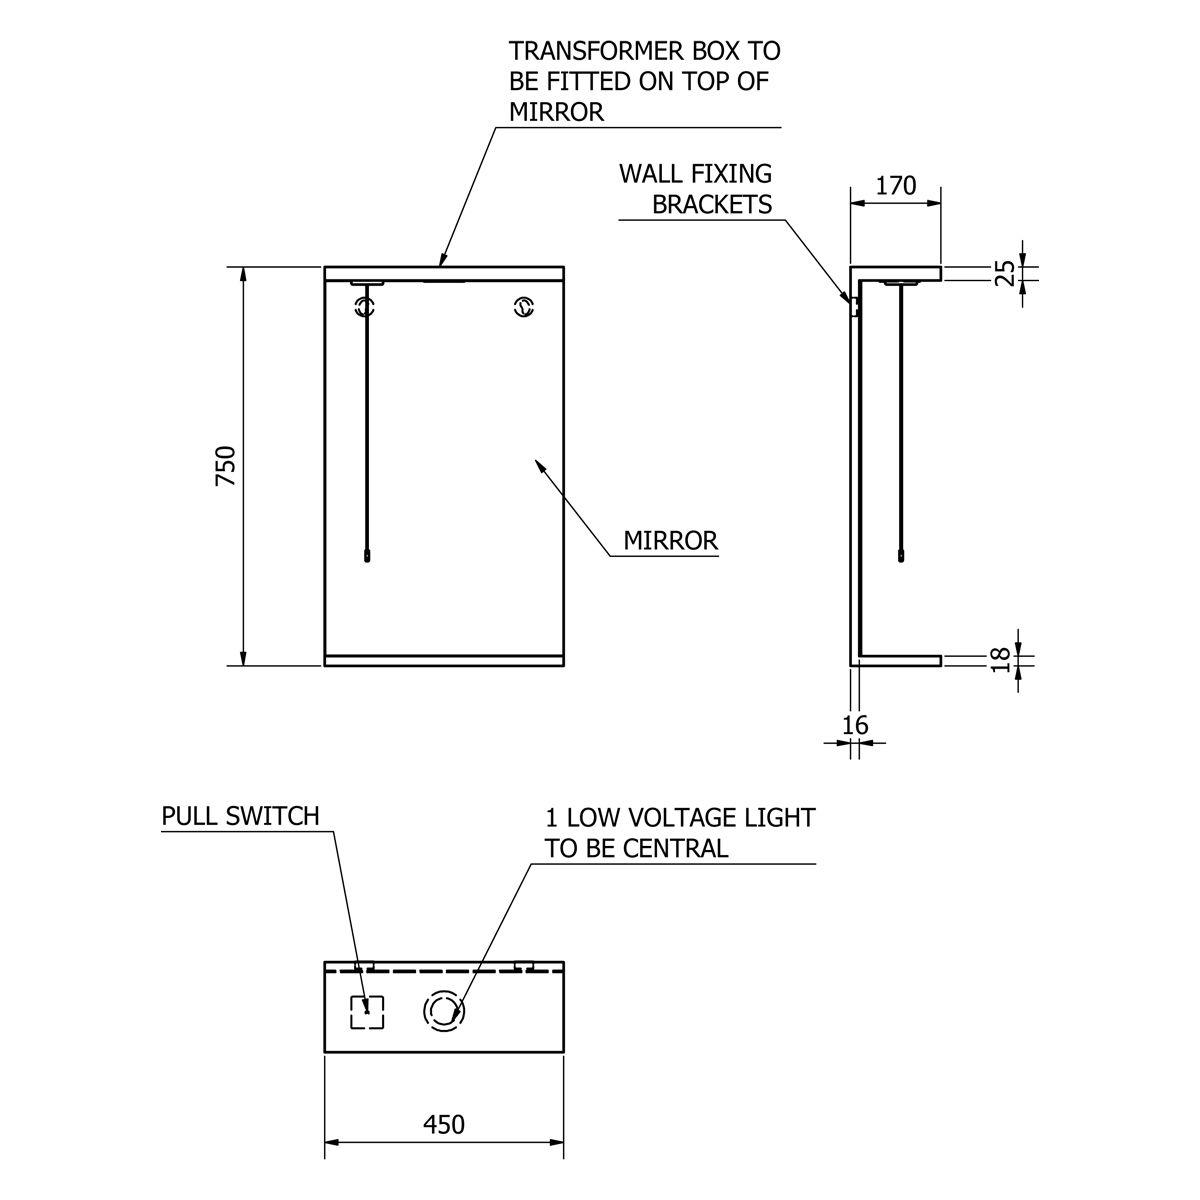 Kartell Impakt Mirror and Light 450mm Dimensions